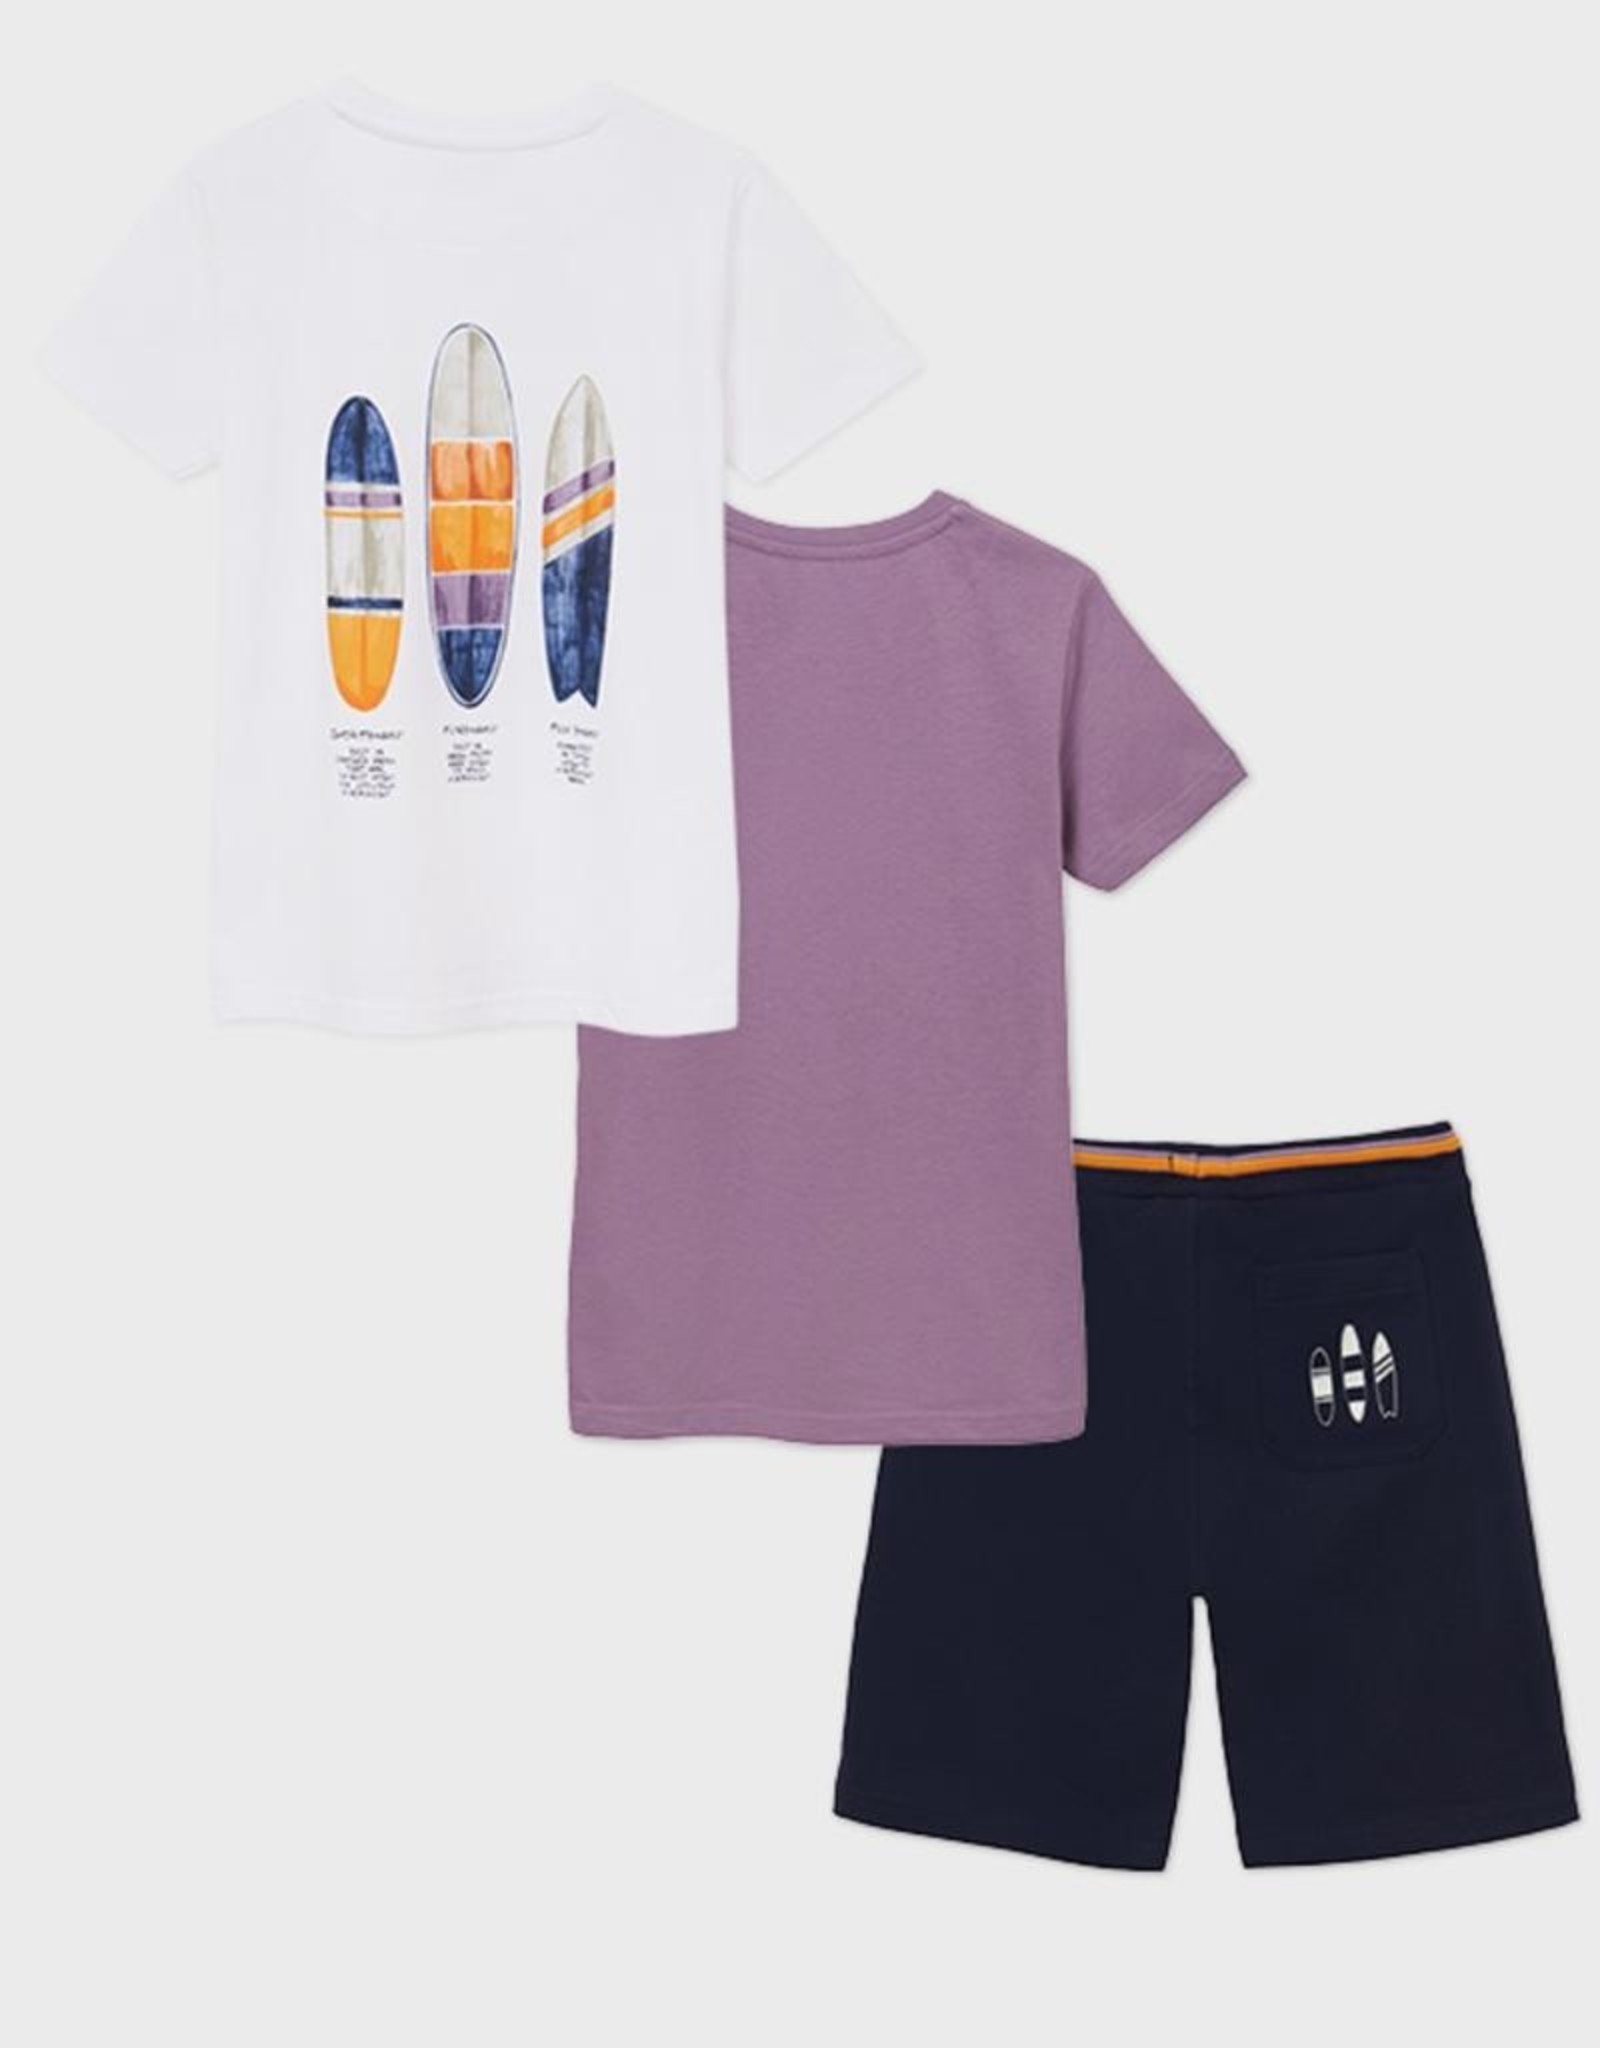 Mayoral 2 Surf Pint T-shirts Set with Shorts